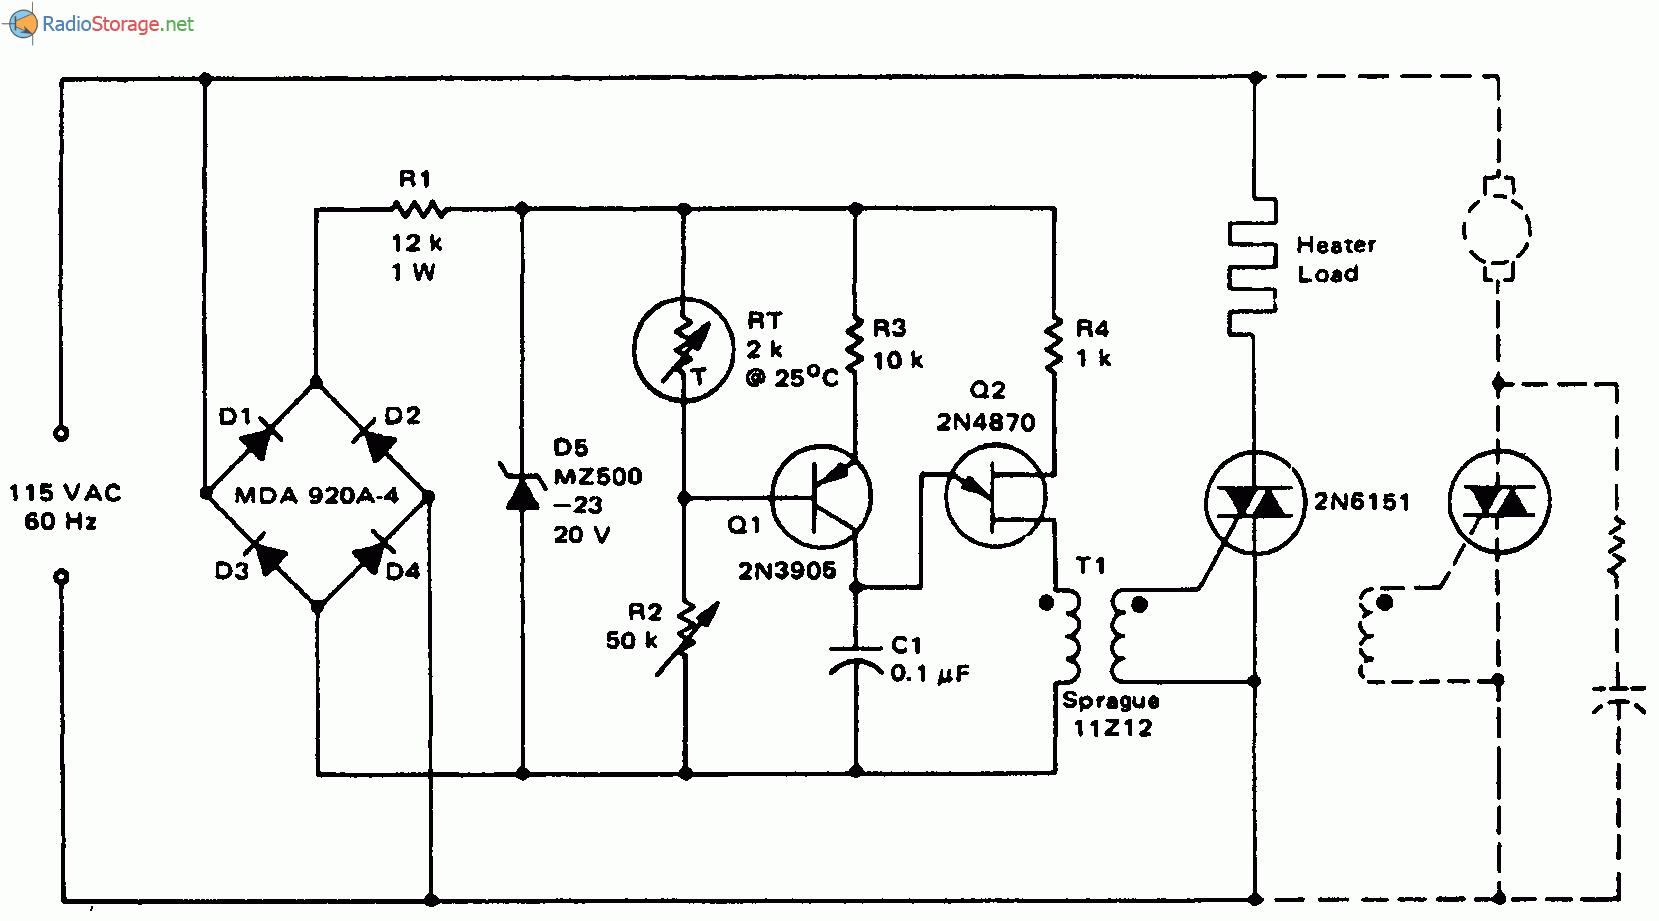 Регулятор температуры электронный схема фото 225